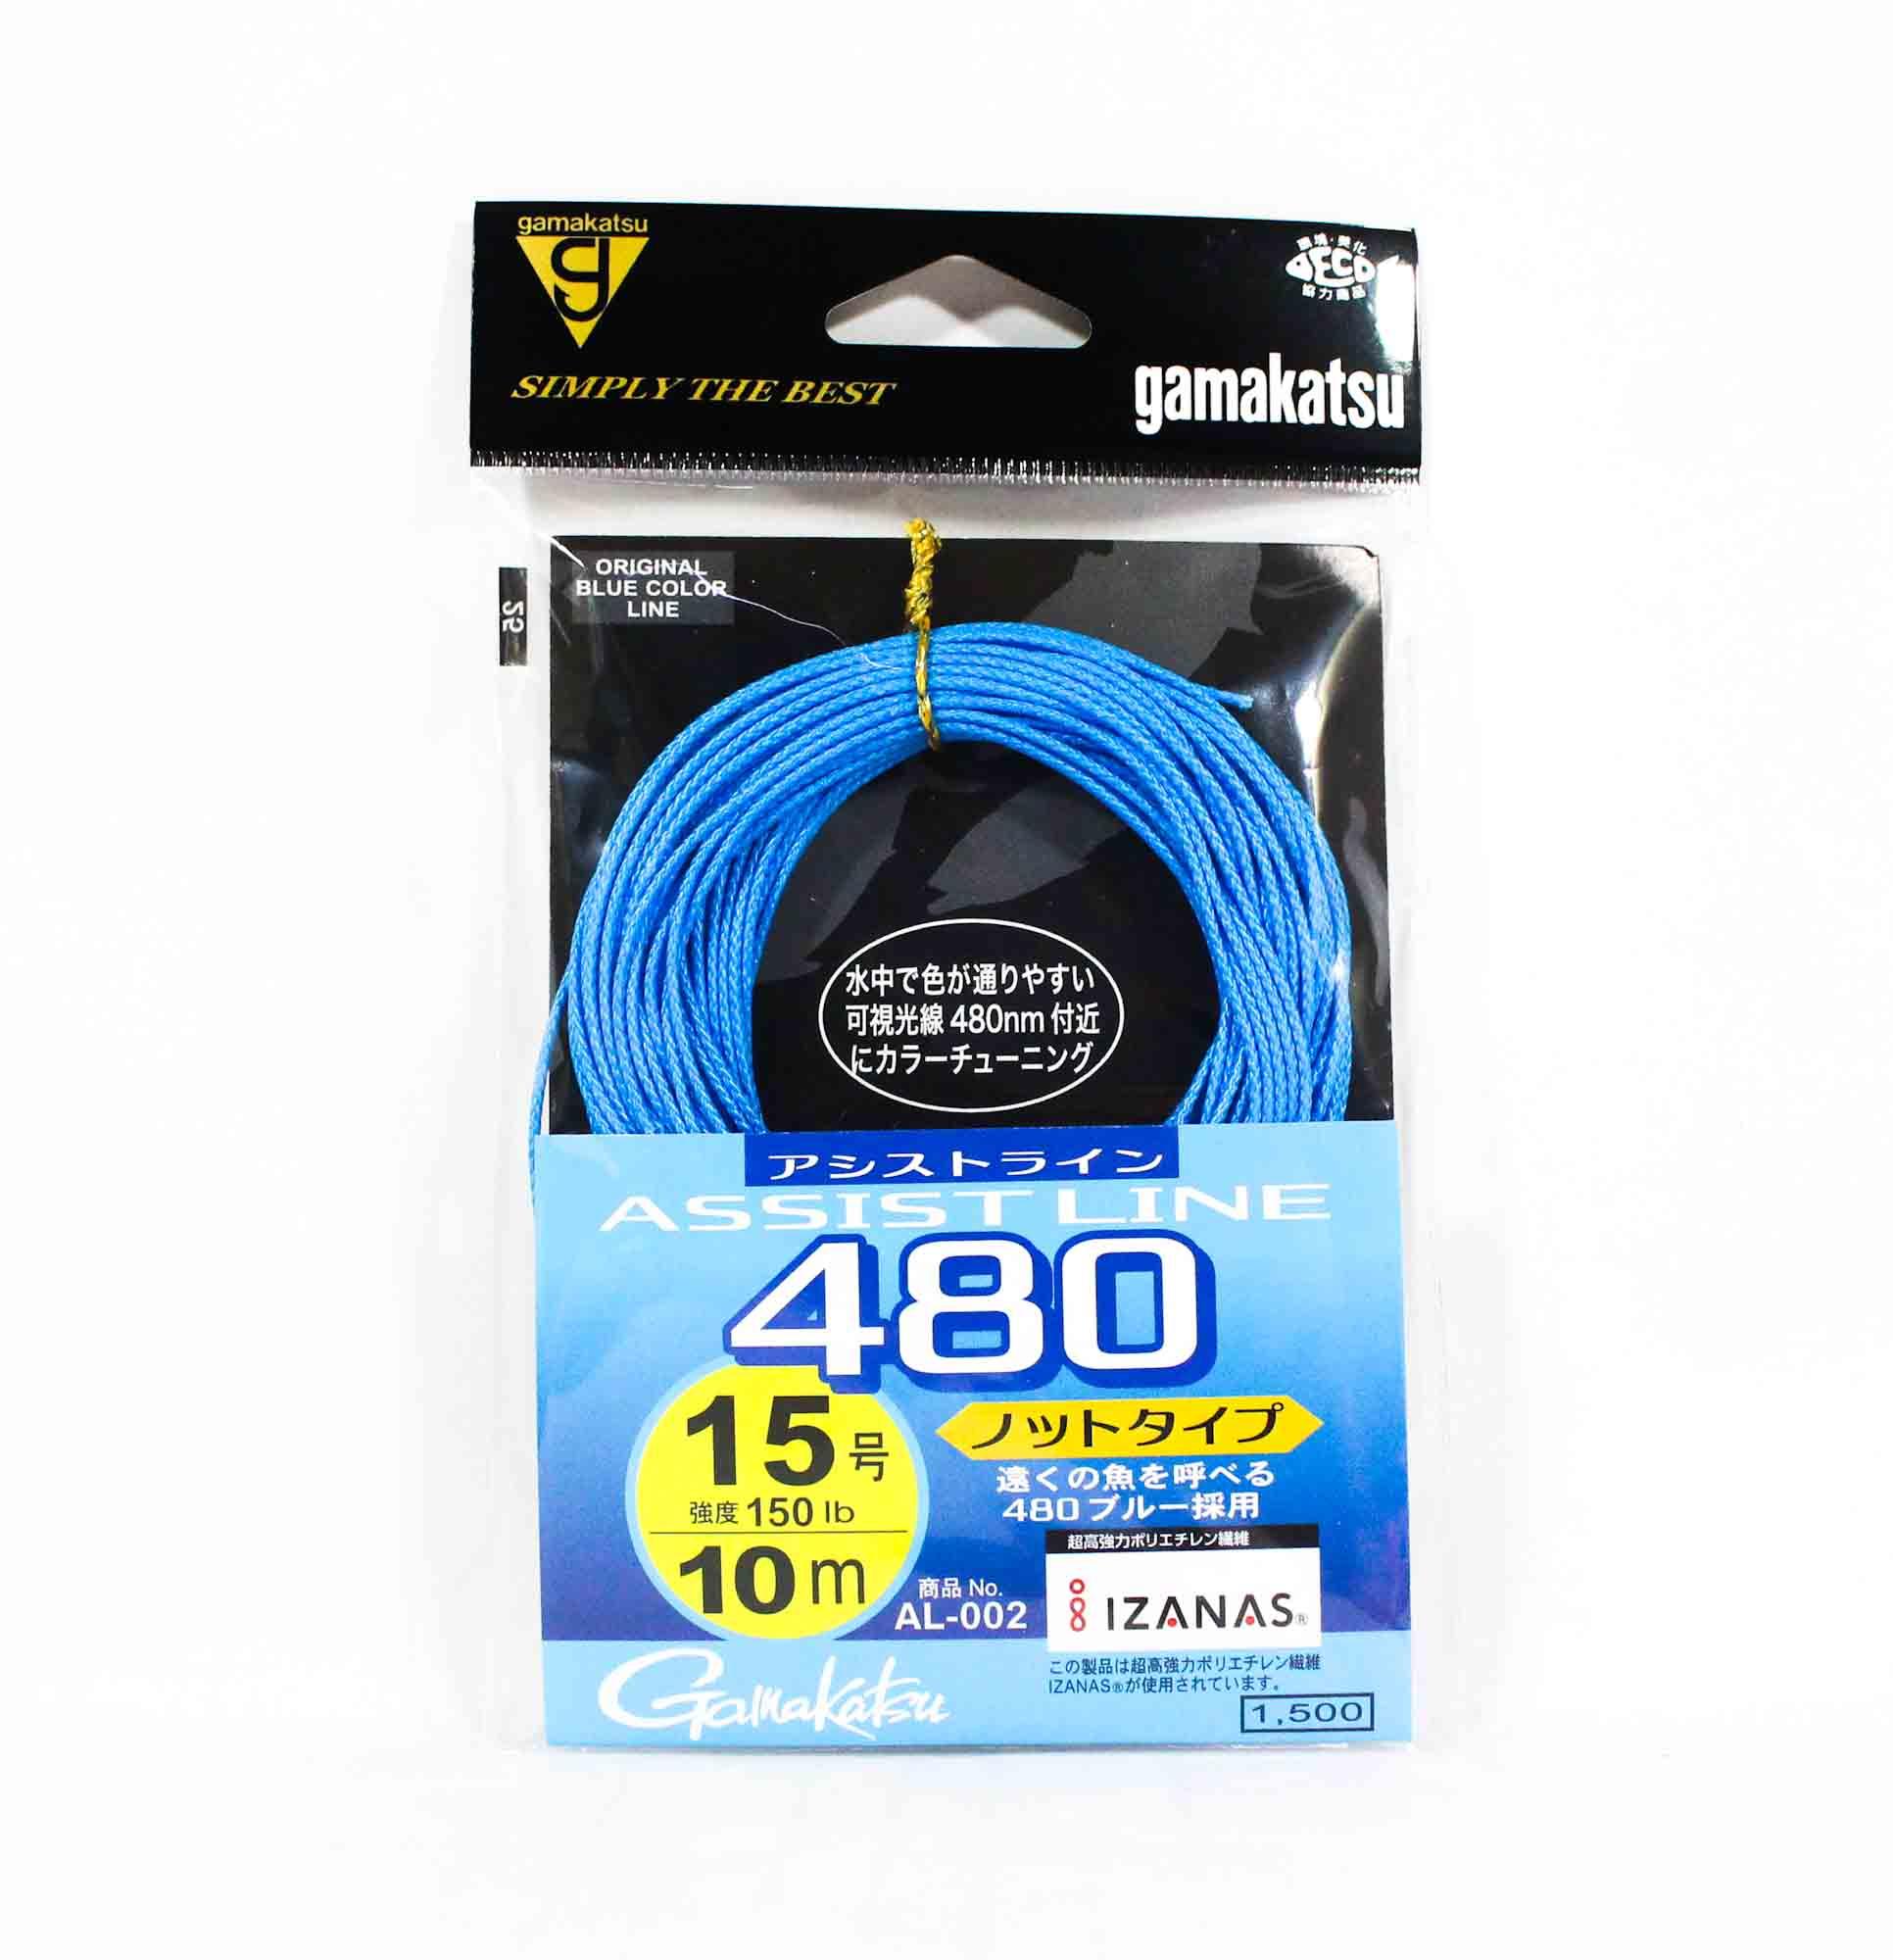 Gamakatsu 19303 AL002 Assist Line 480 Knot Type 10m Size 15 150lb (8500)